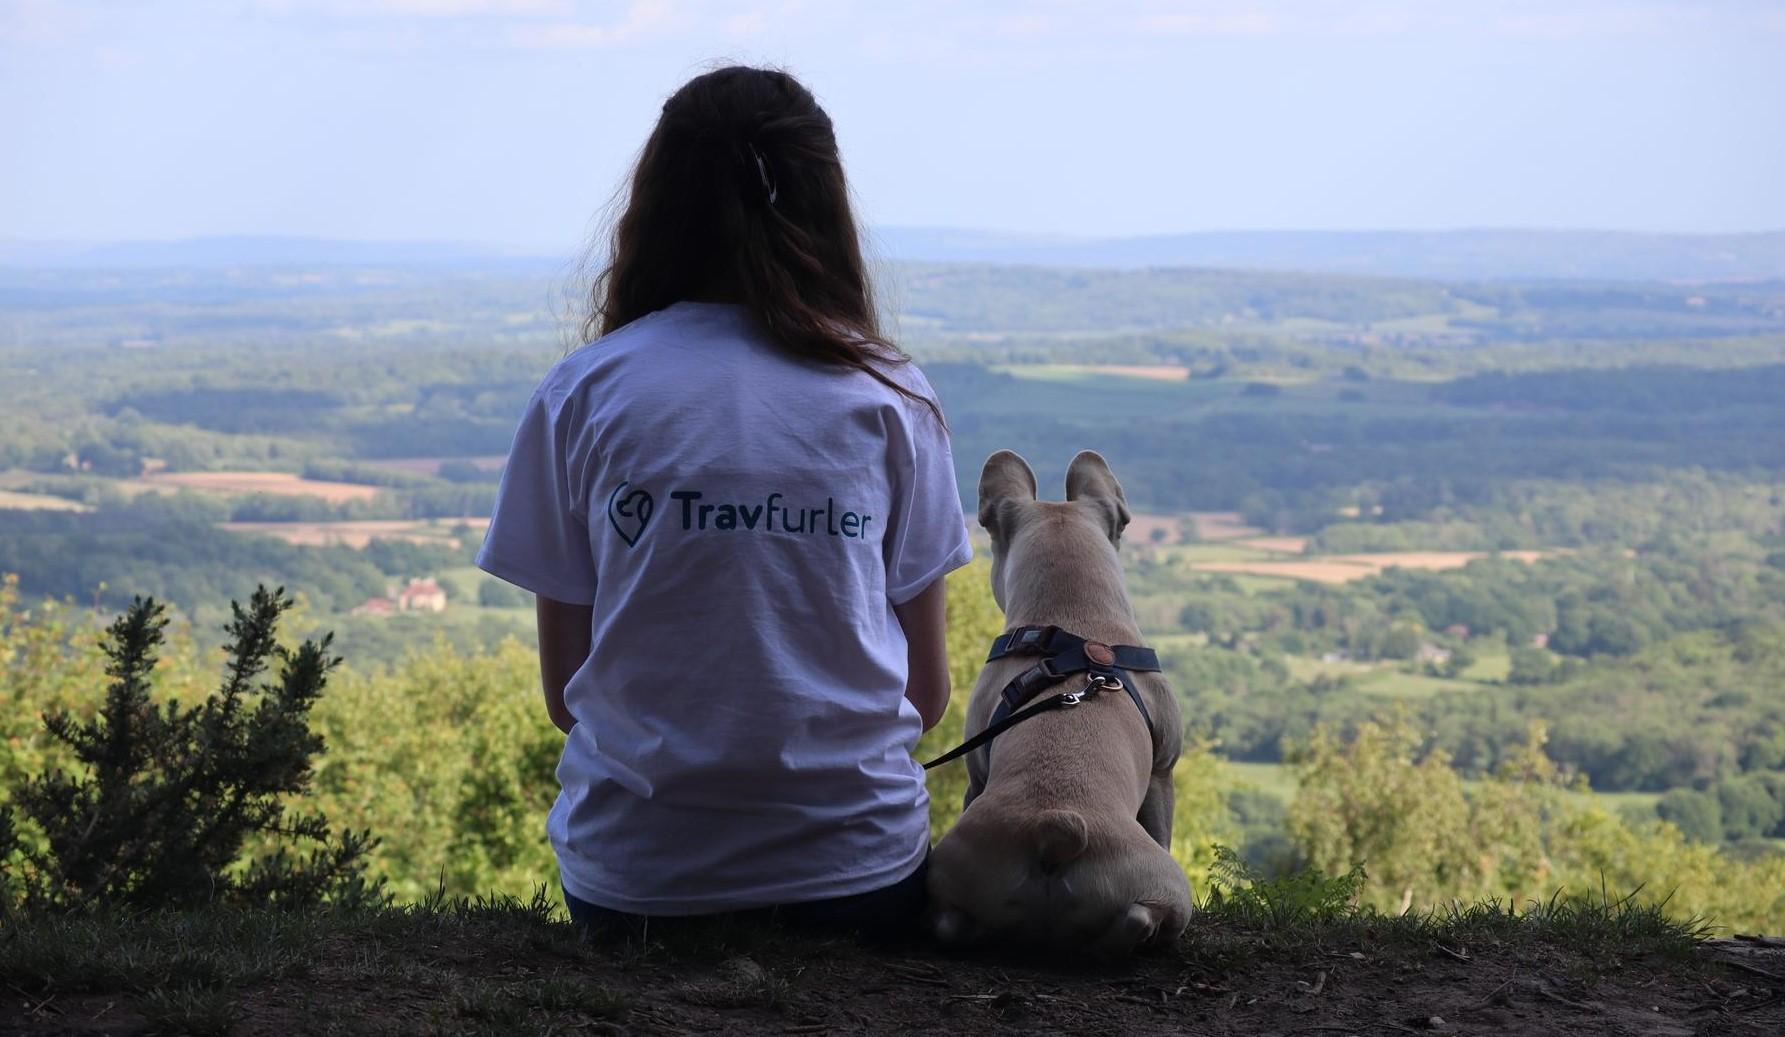 Why Choose Travfurler For Pet Travel Needs?